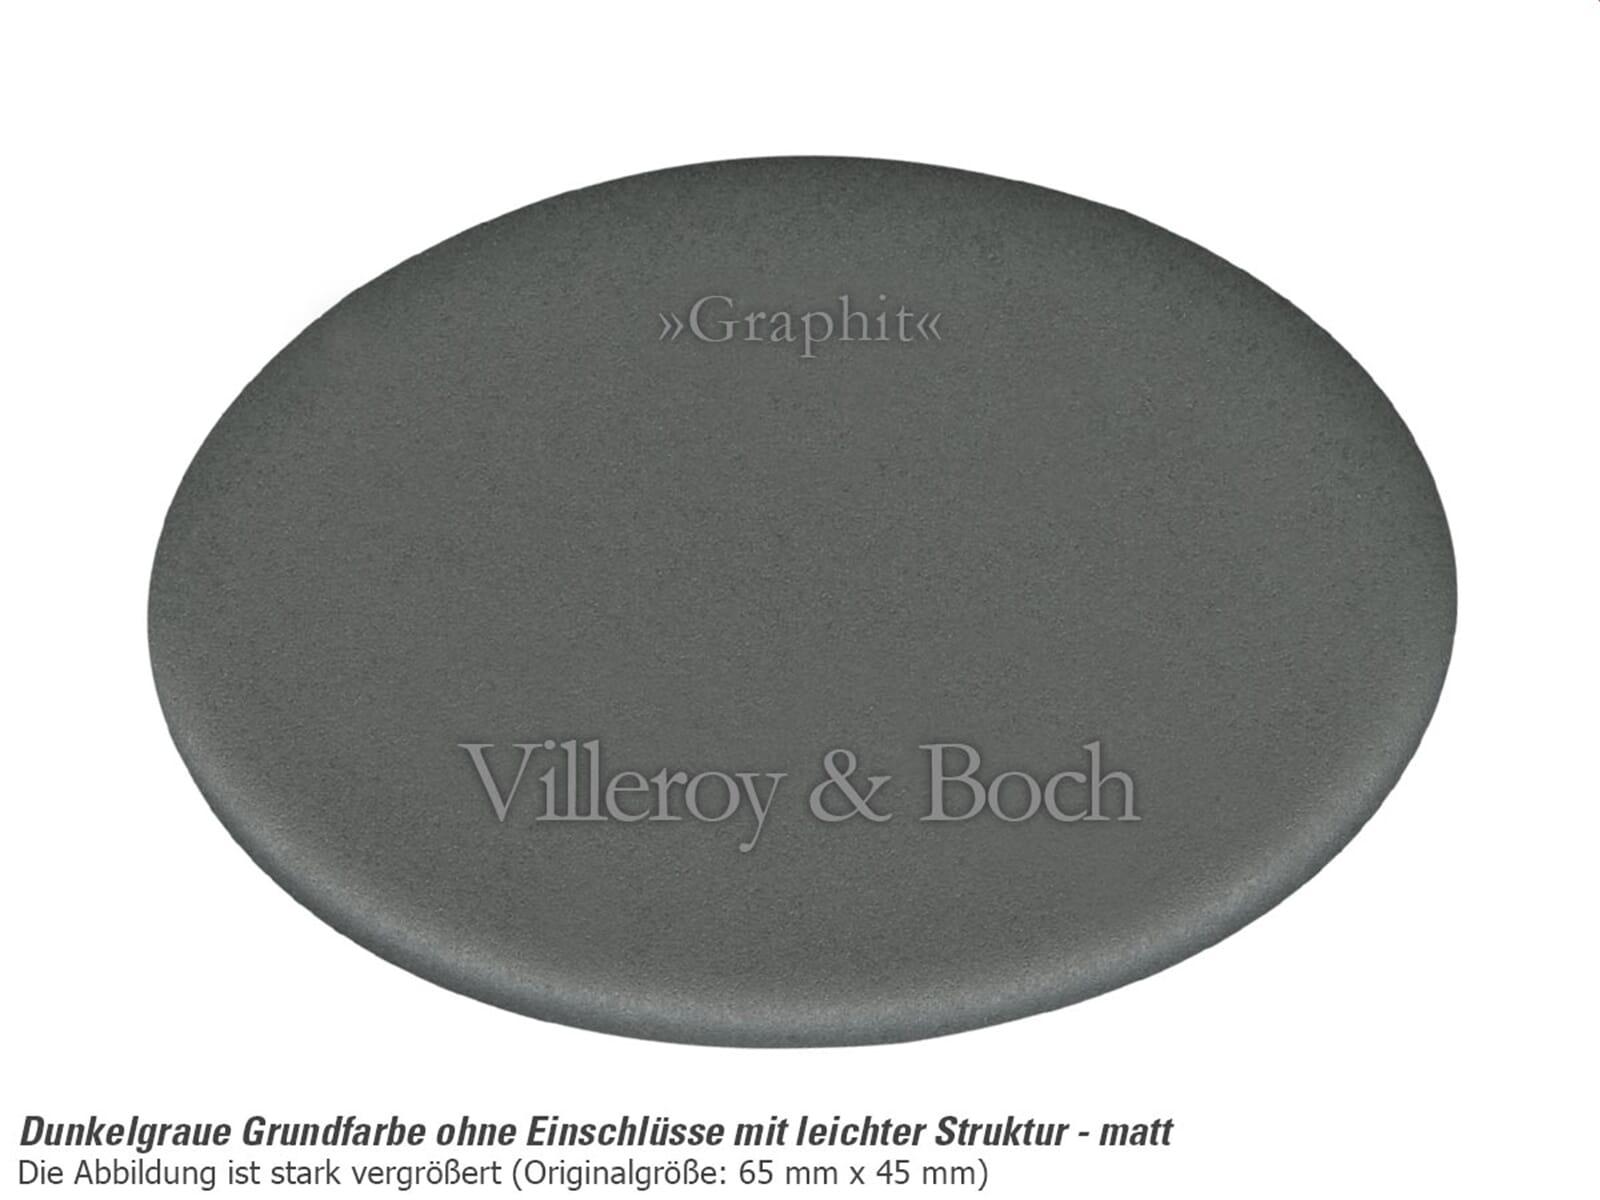 Villeroy & Boch Flavia 60 Graphit - 3304 02 i4 Keramikspüle Exzenterbetätigung